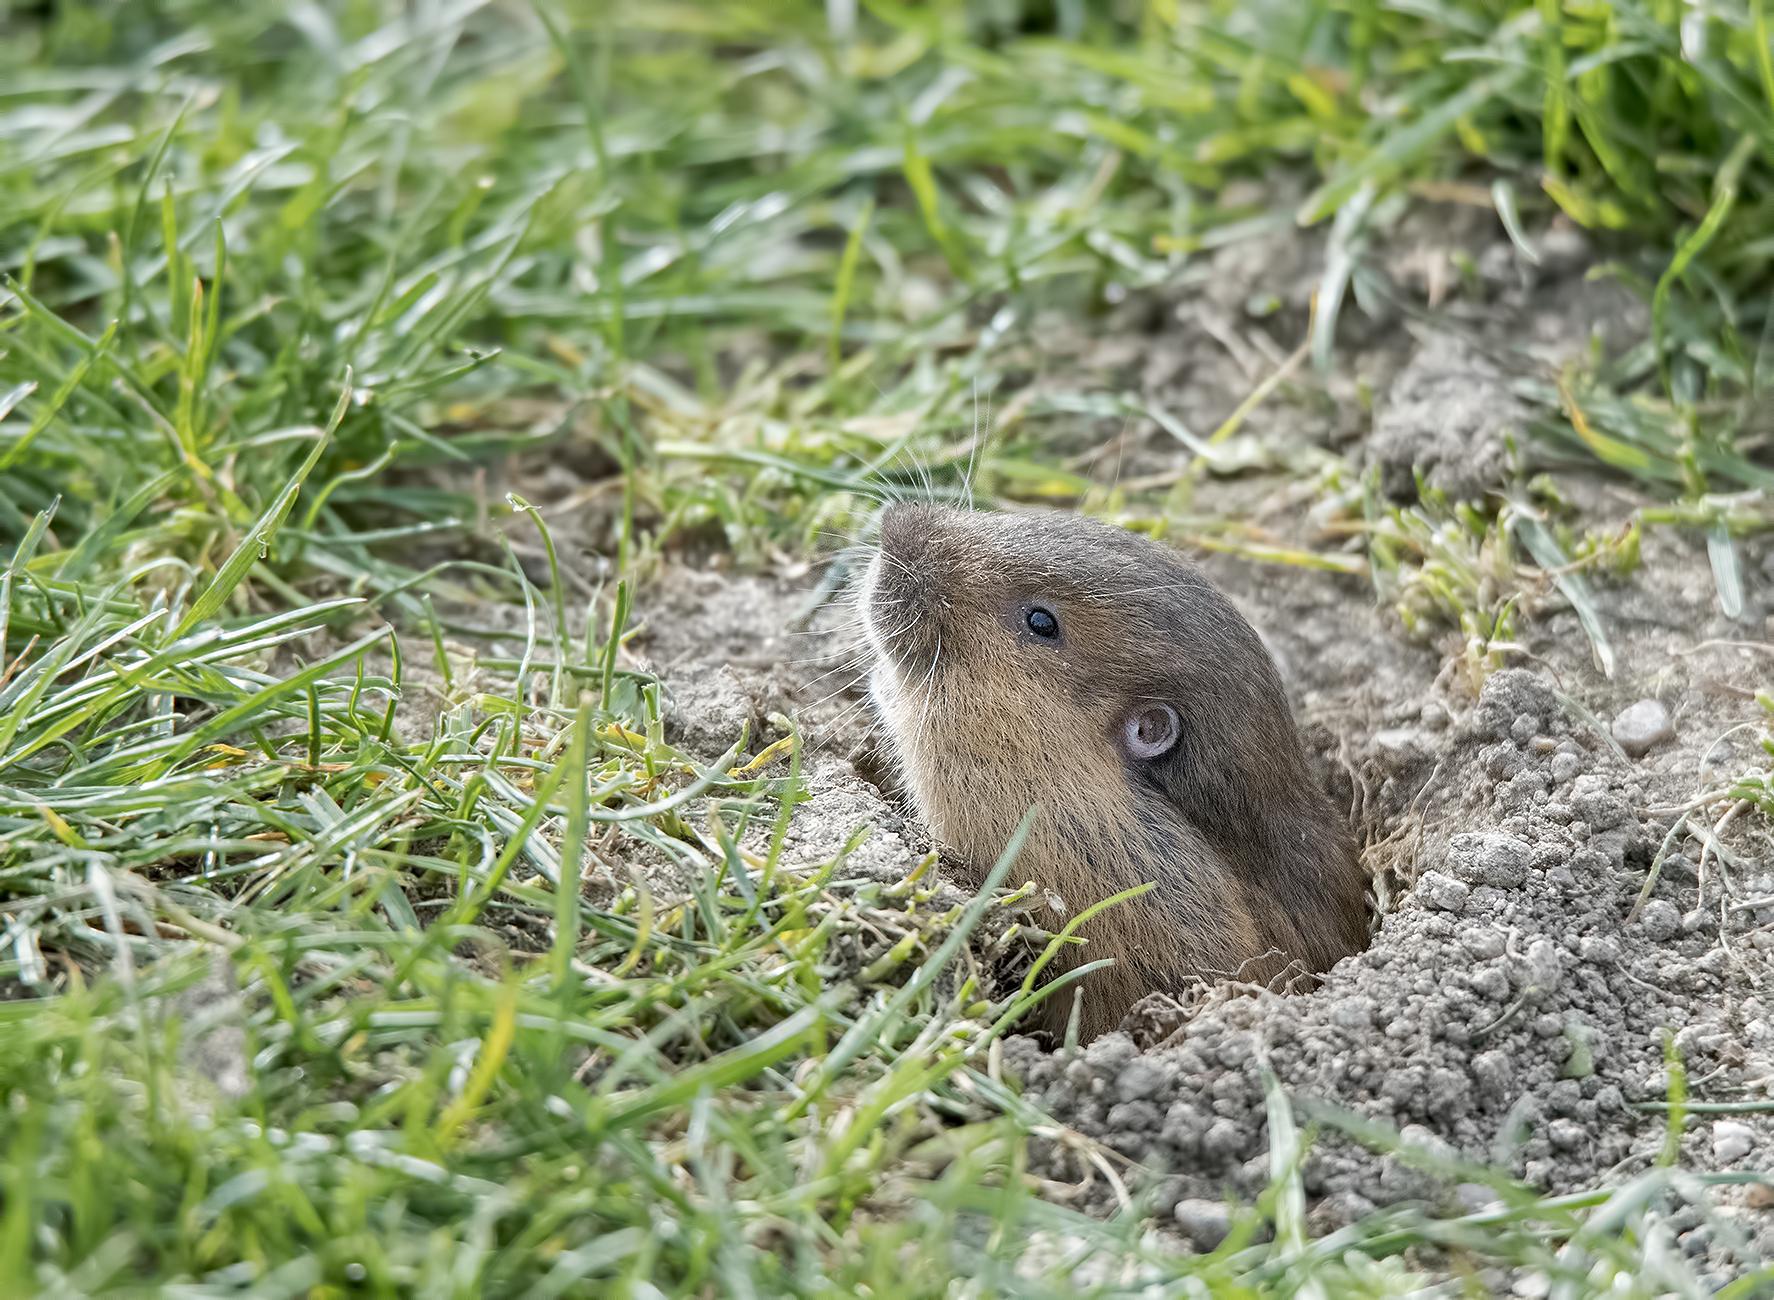 southern oregon university field mole groundhog muscrat gopher